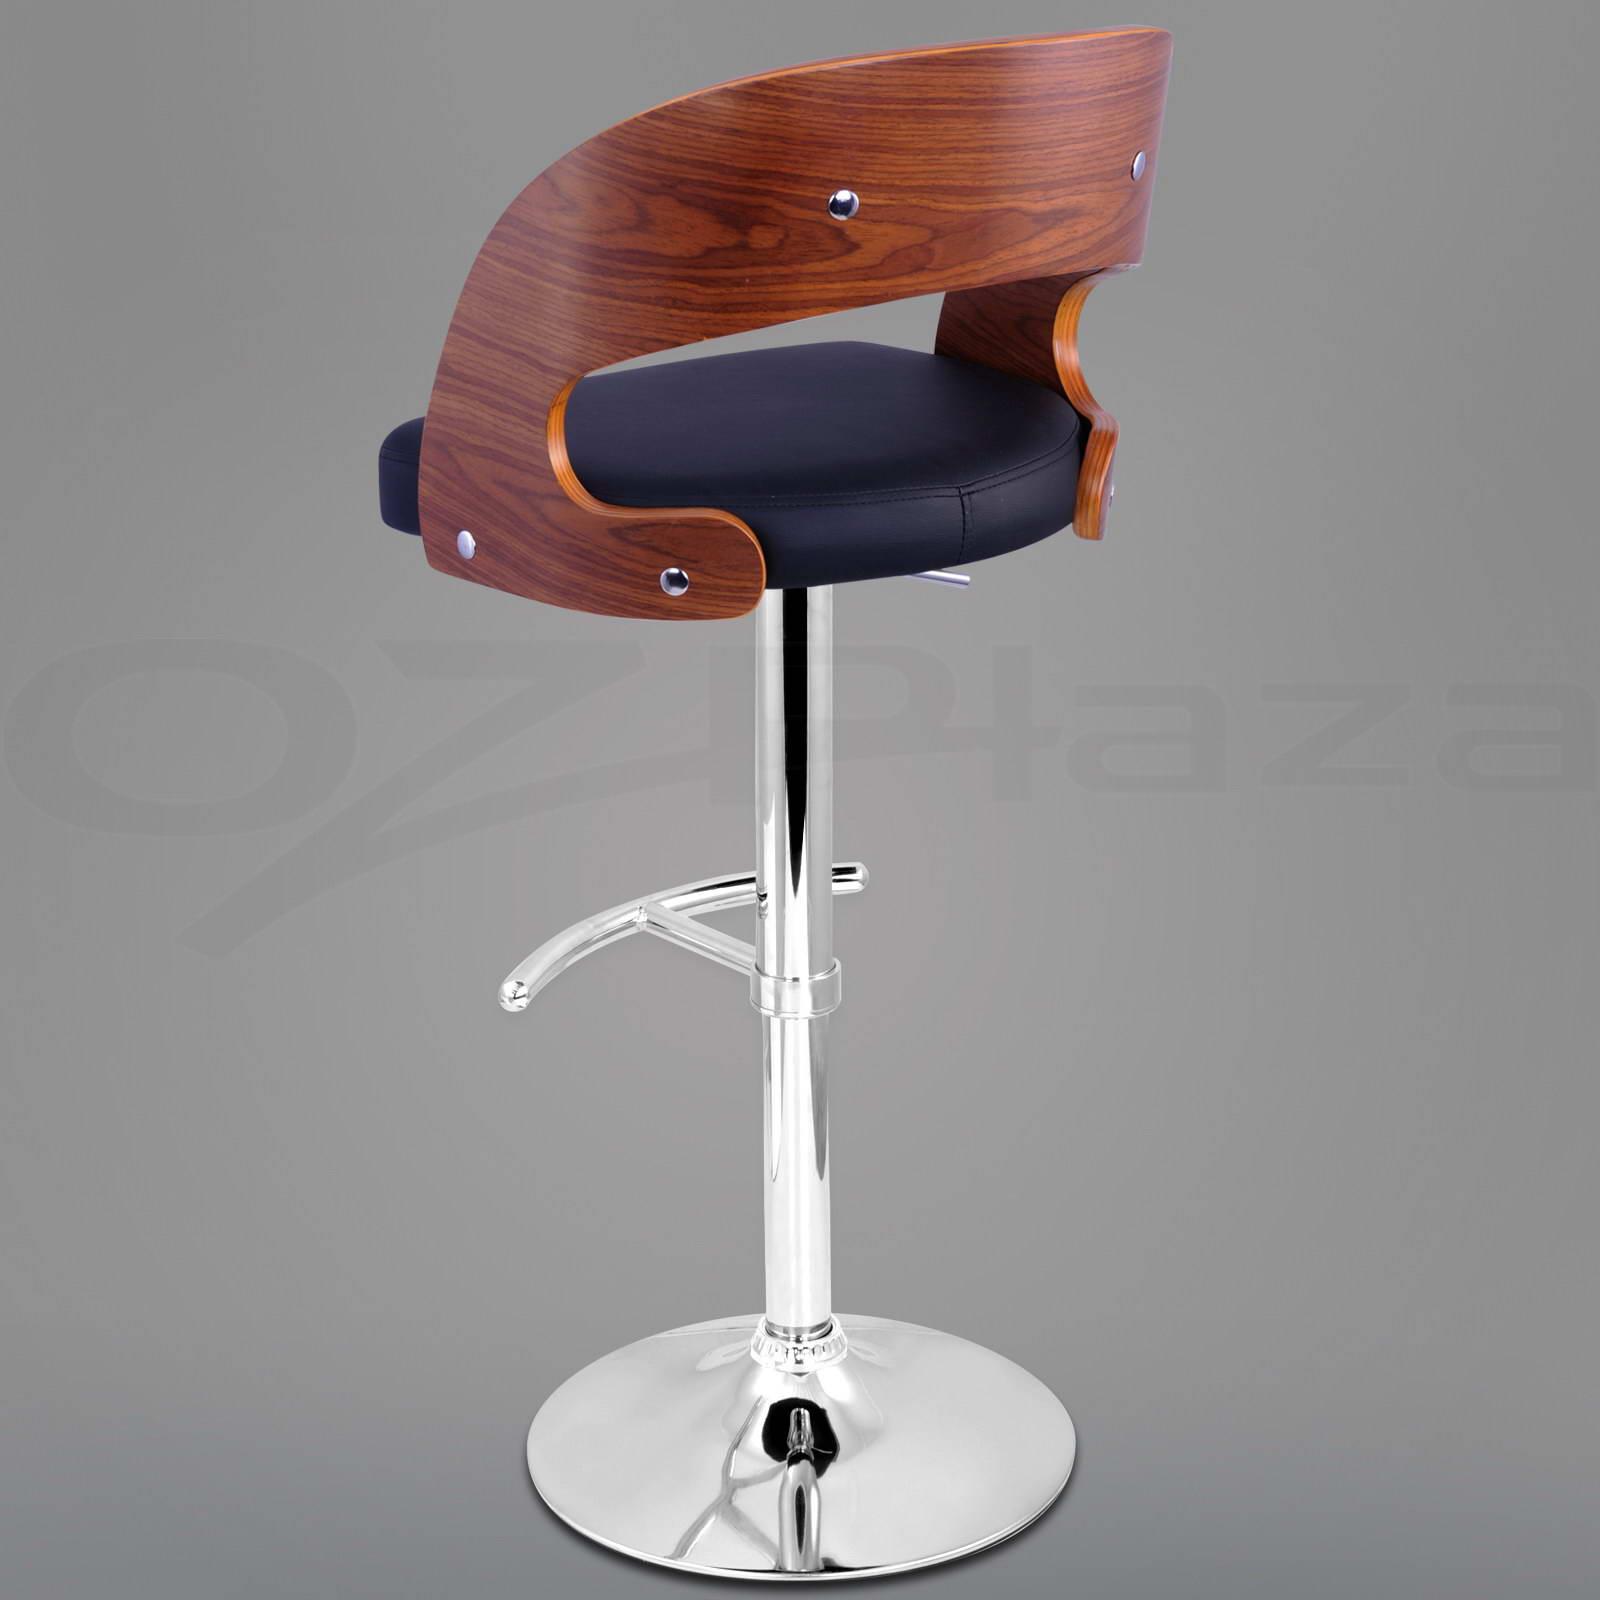 4X Wooden BAR Stool Kitchen Chair Dining Black White PU  : BA TW 8065 BKX4 VAR P04 from www.ebay.com.au size 1600 x 1600 jpeg 94kB